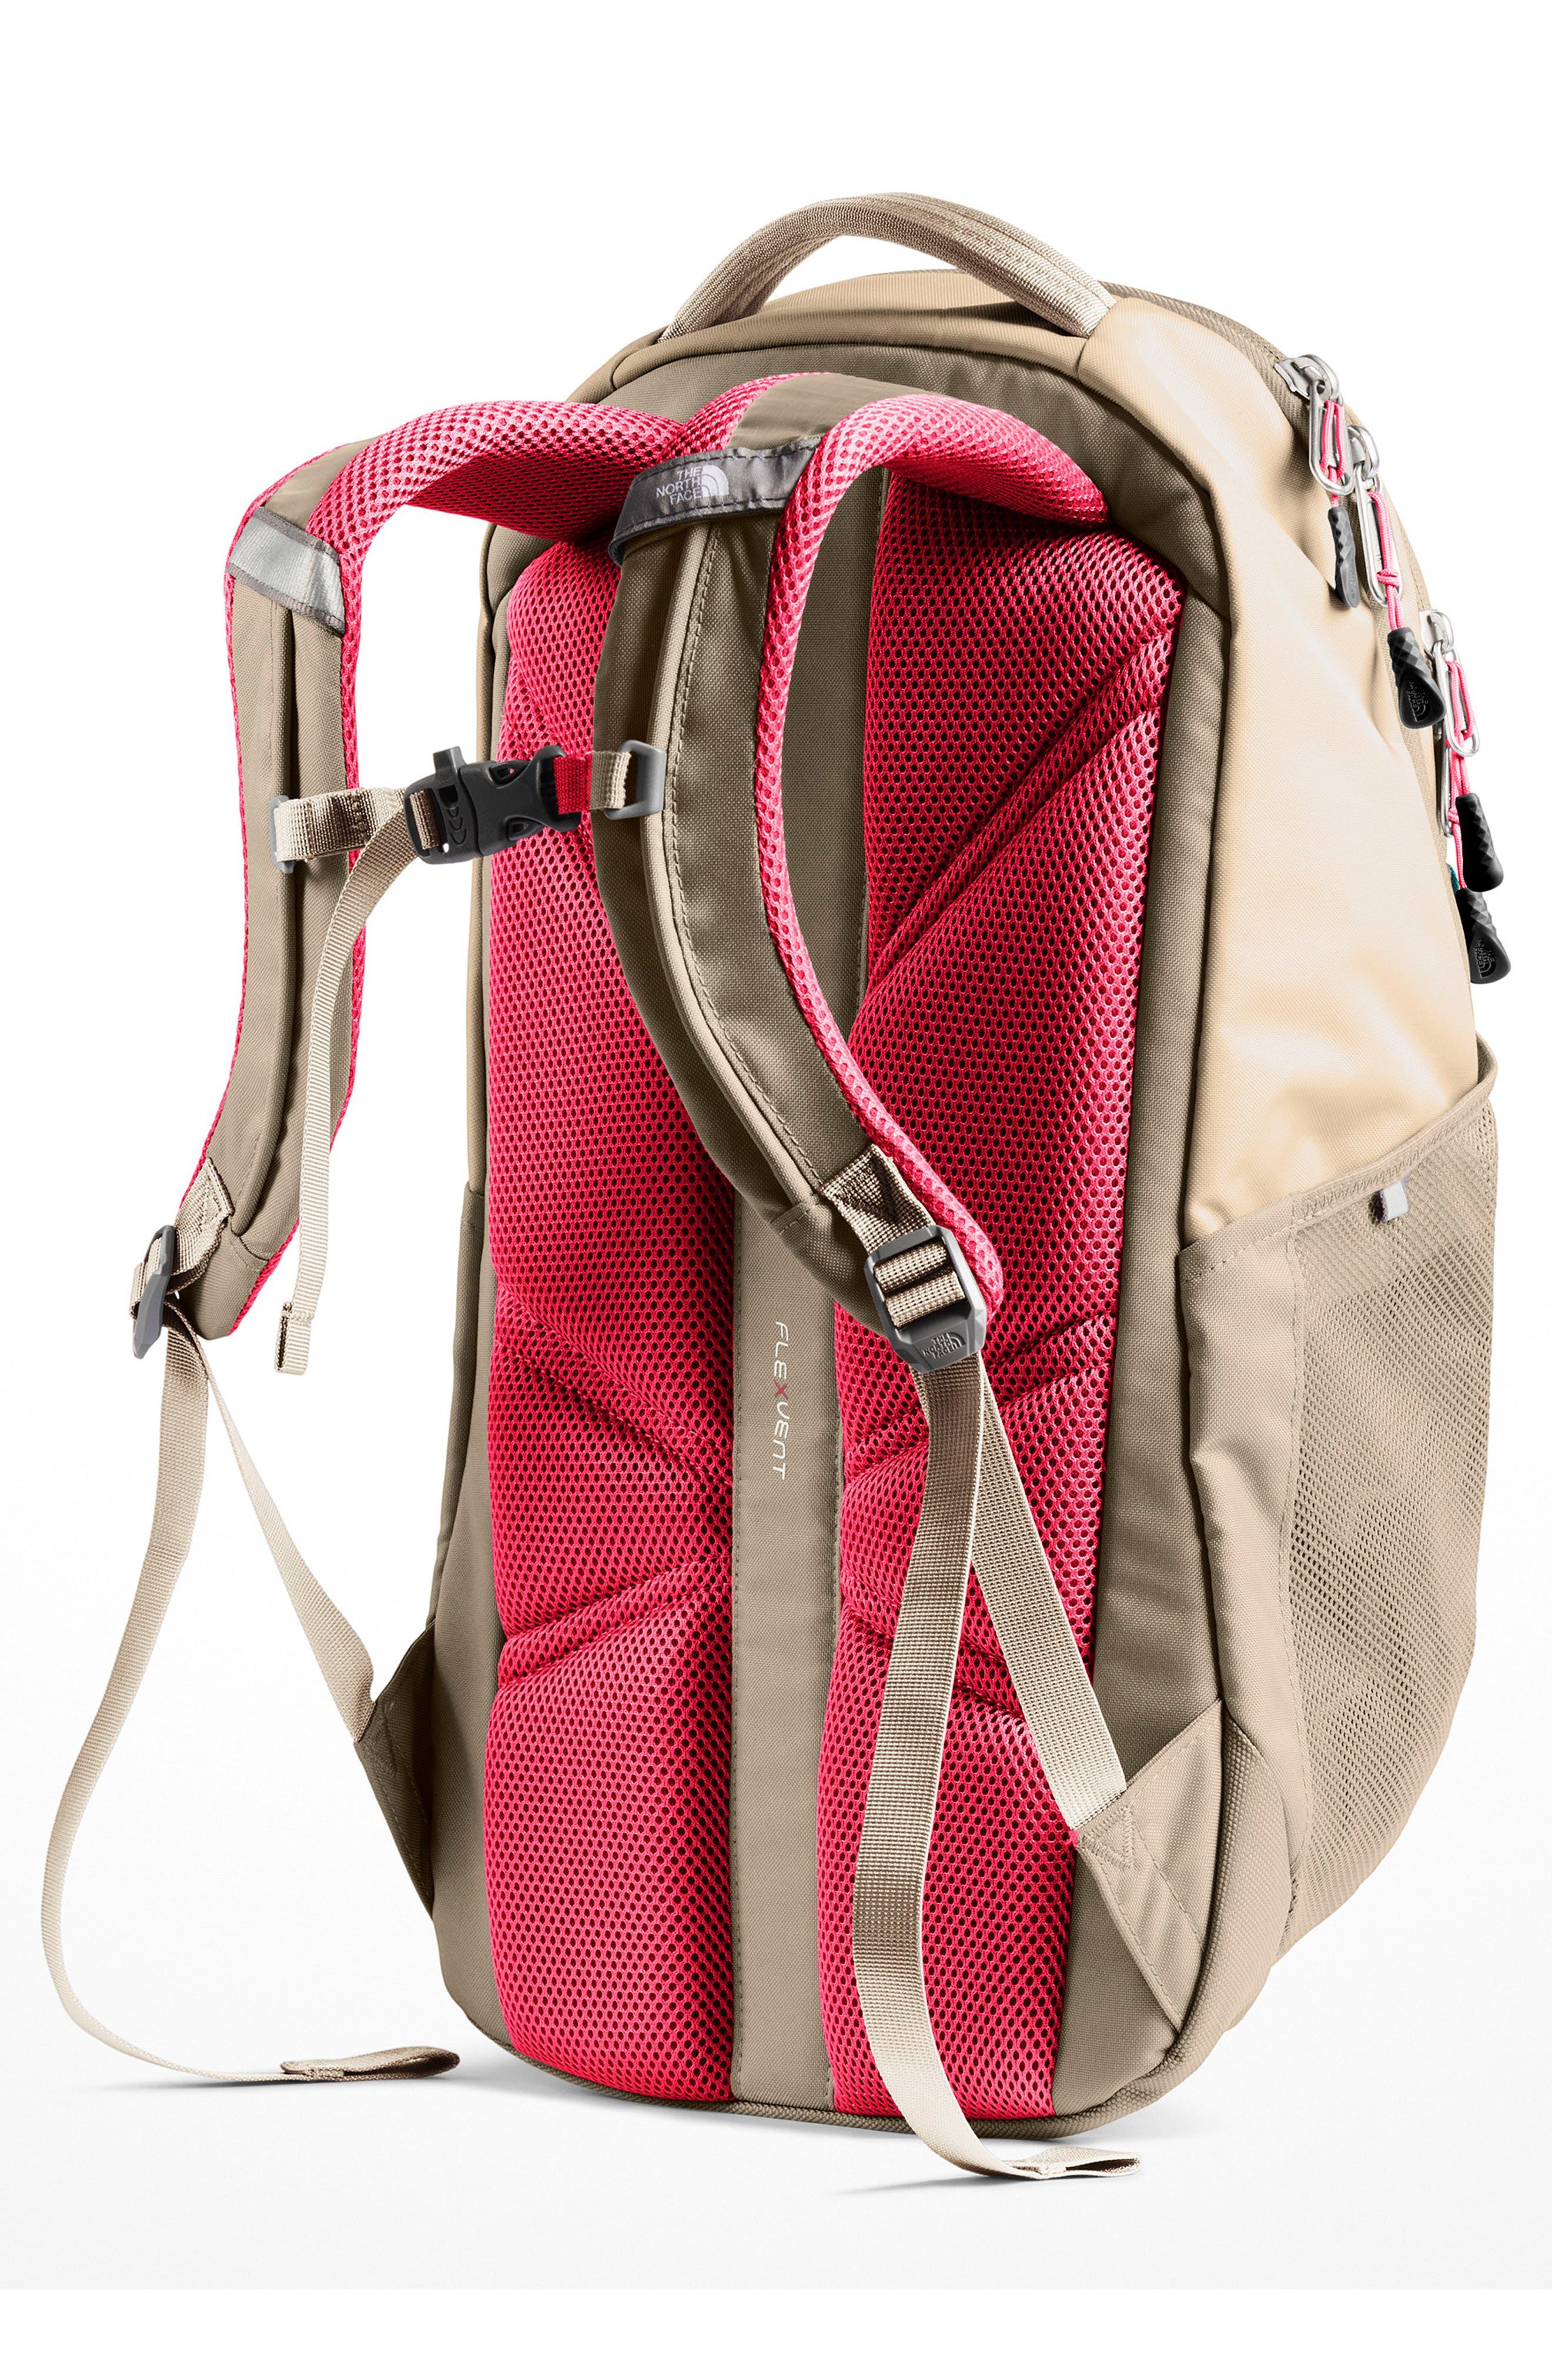 Vault Backpack,                             Alternate thumbnail 3, color,                             251